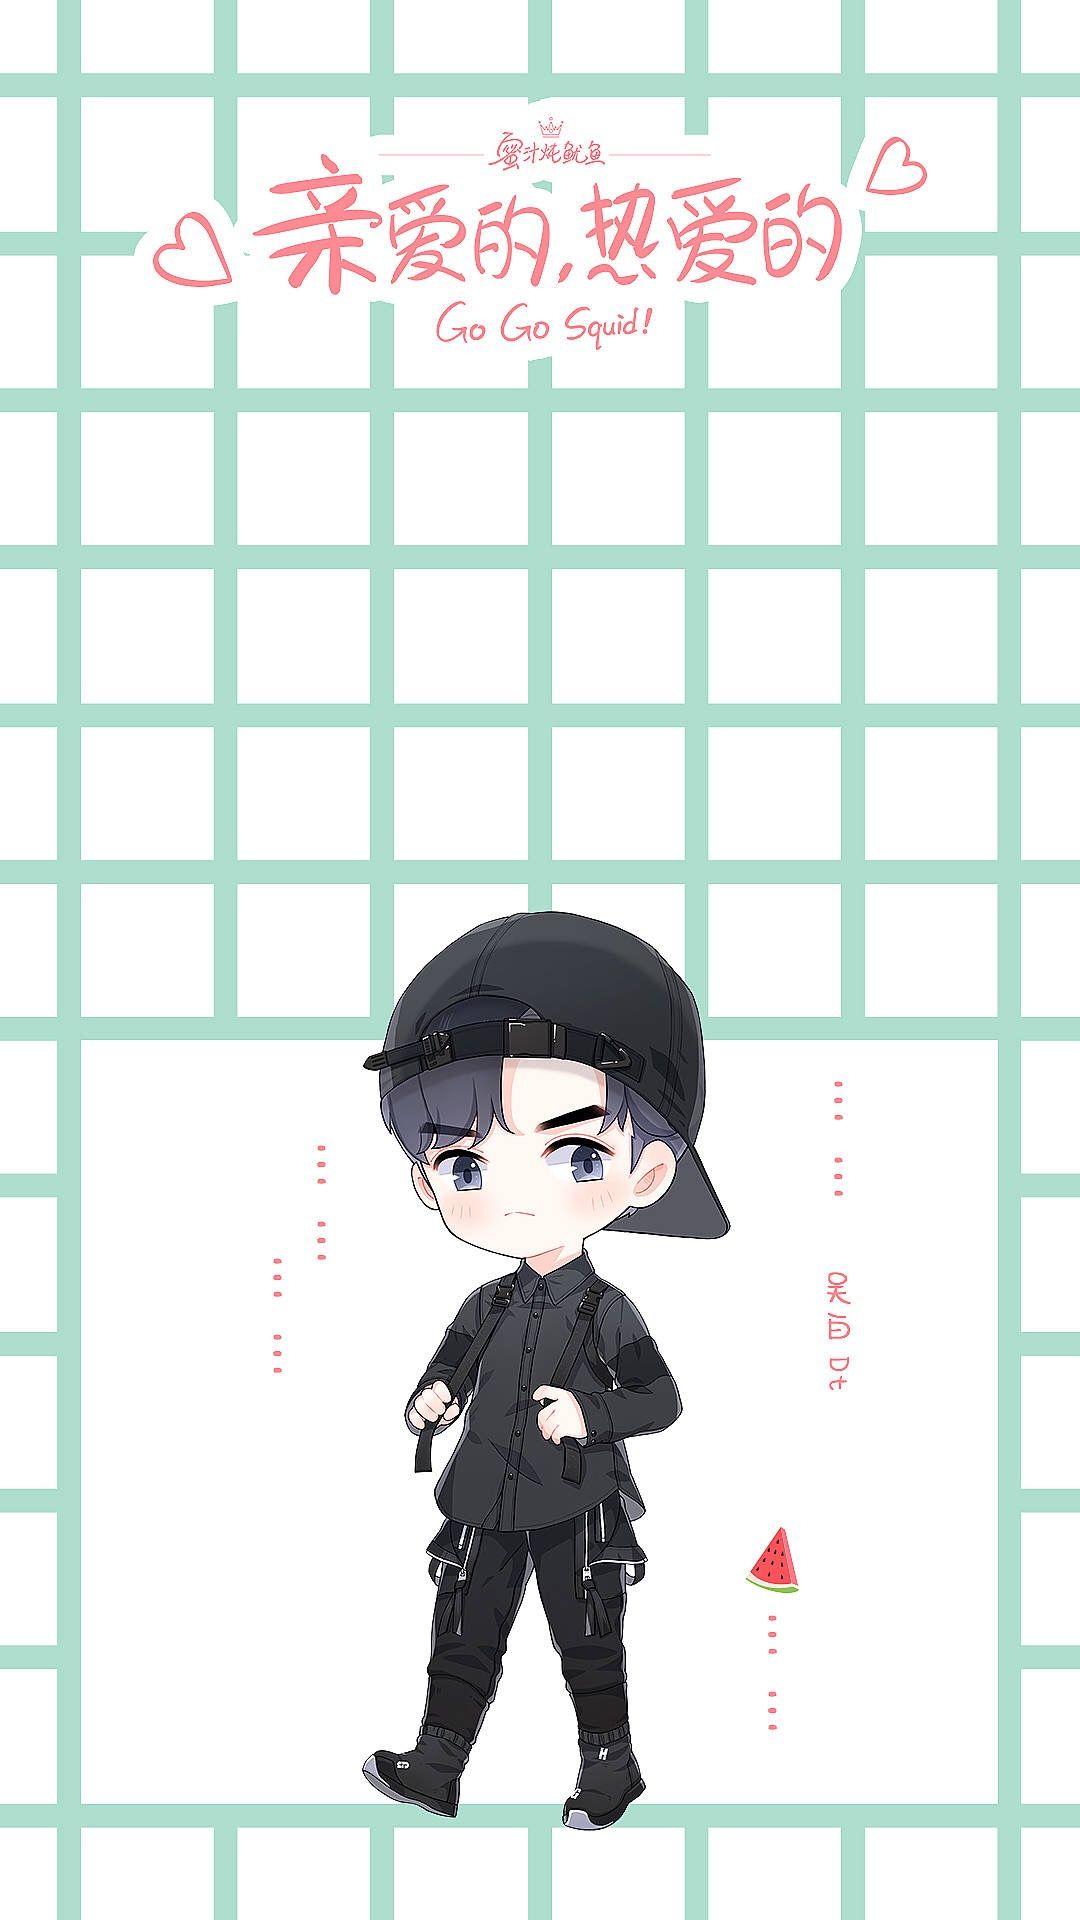 Pin By Dương Hiện On Go Go Squid Cute Love Memes Anime Chibi Anime Love Story